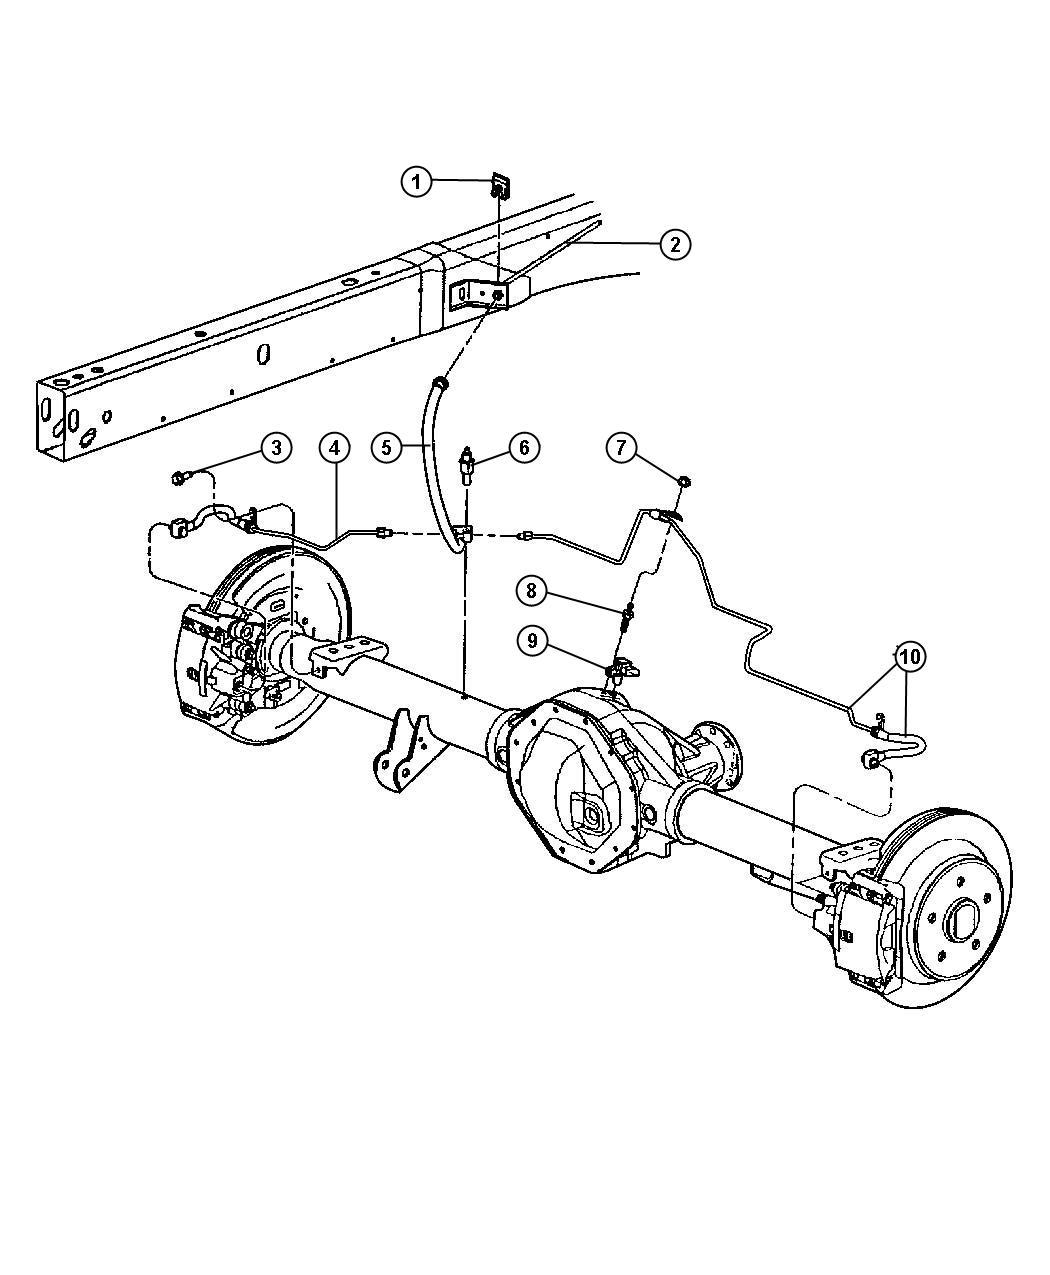 hight resolution of 00i80451 2007 dodge ram 1500 rear differential car autos gallery 2007 dodge ram 2007 dodge ram 3500 fuse box diagram 36 wiring